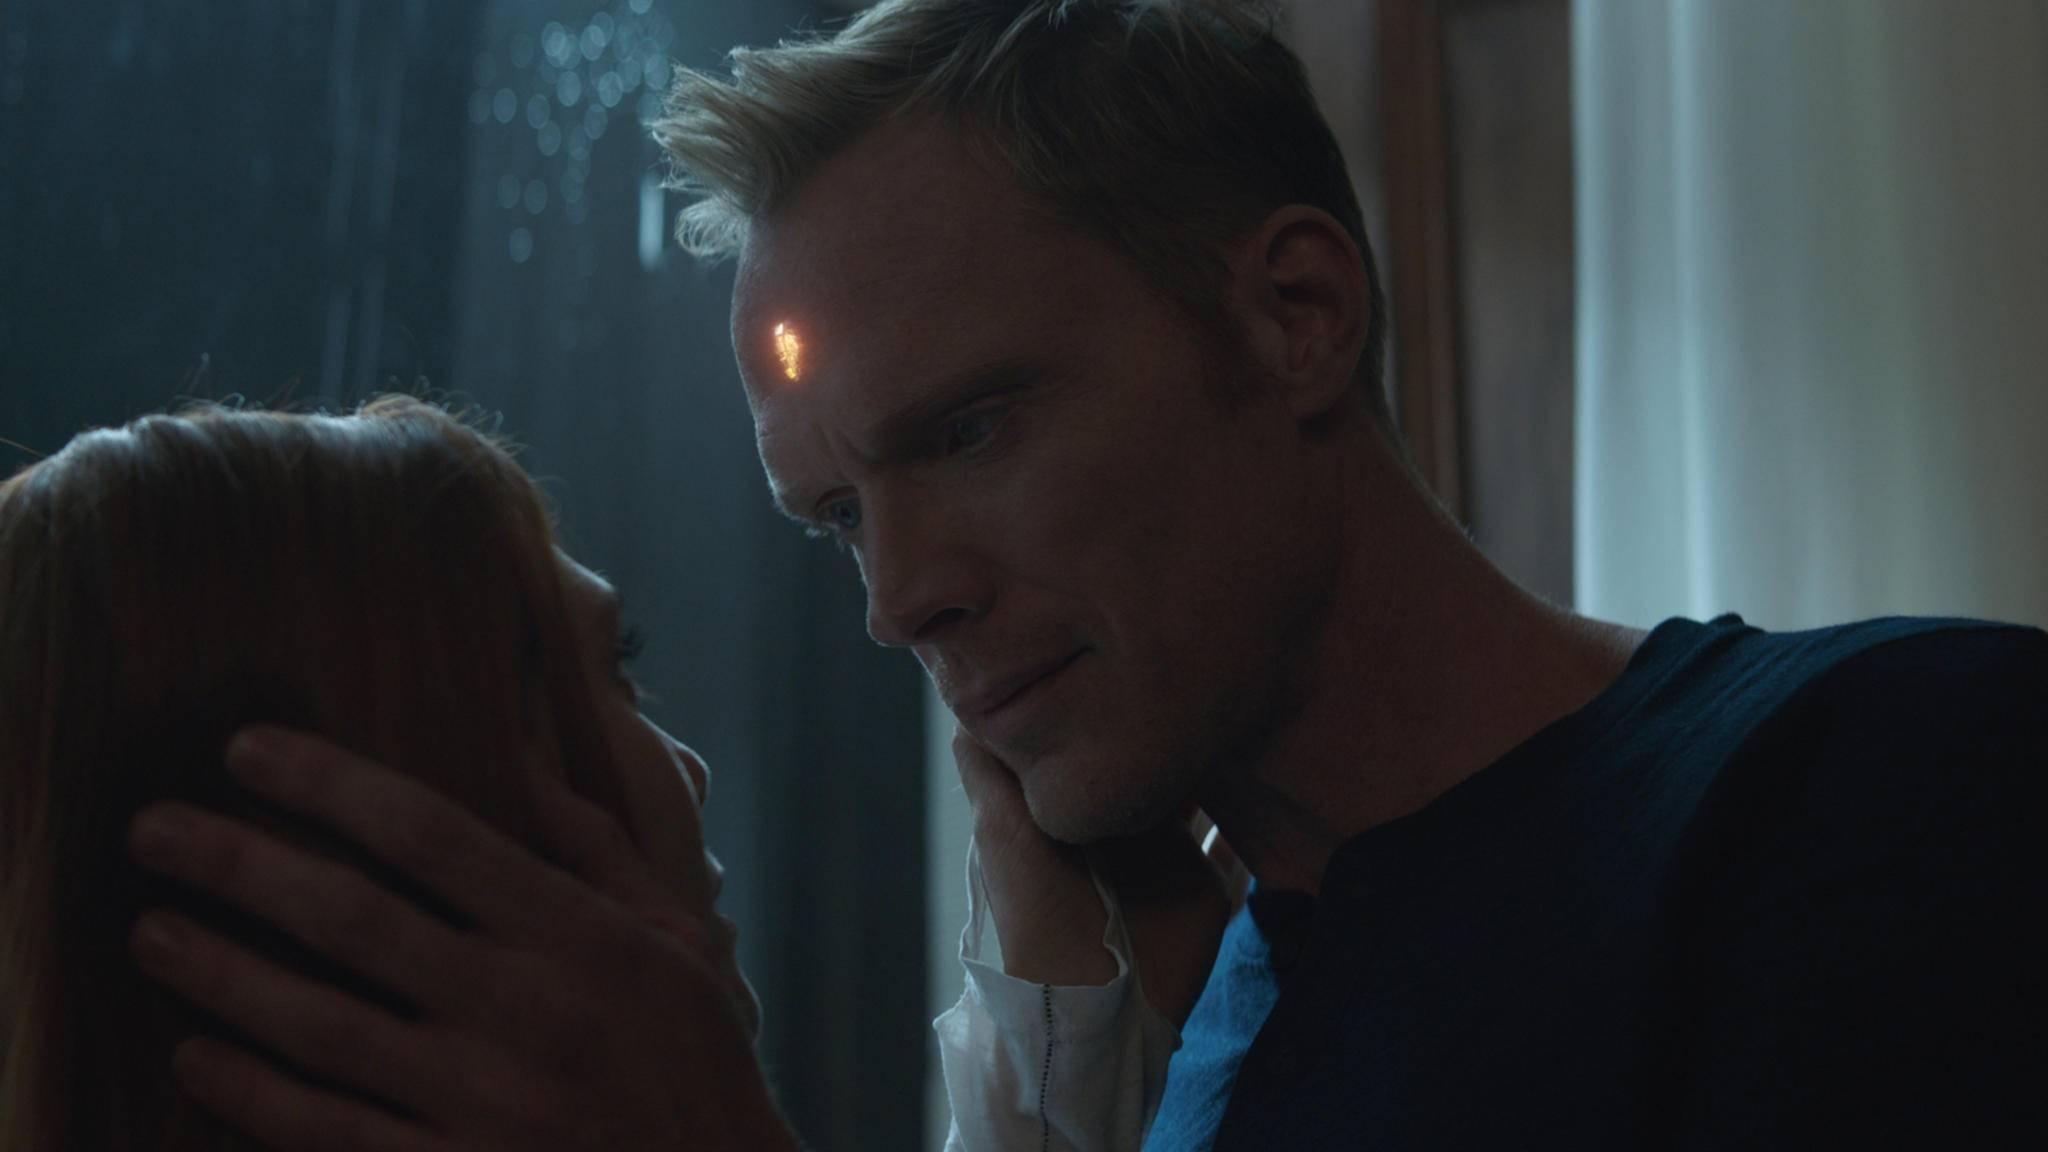 Kann Vision (rechts) Thanos entkommen?